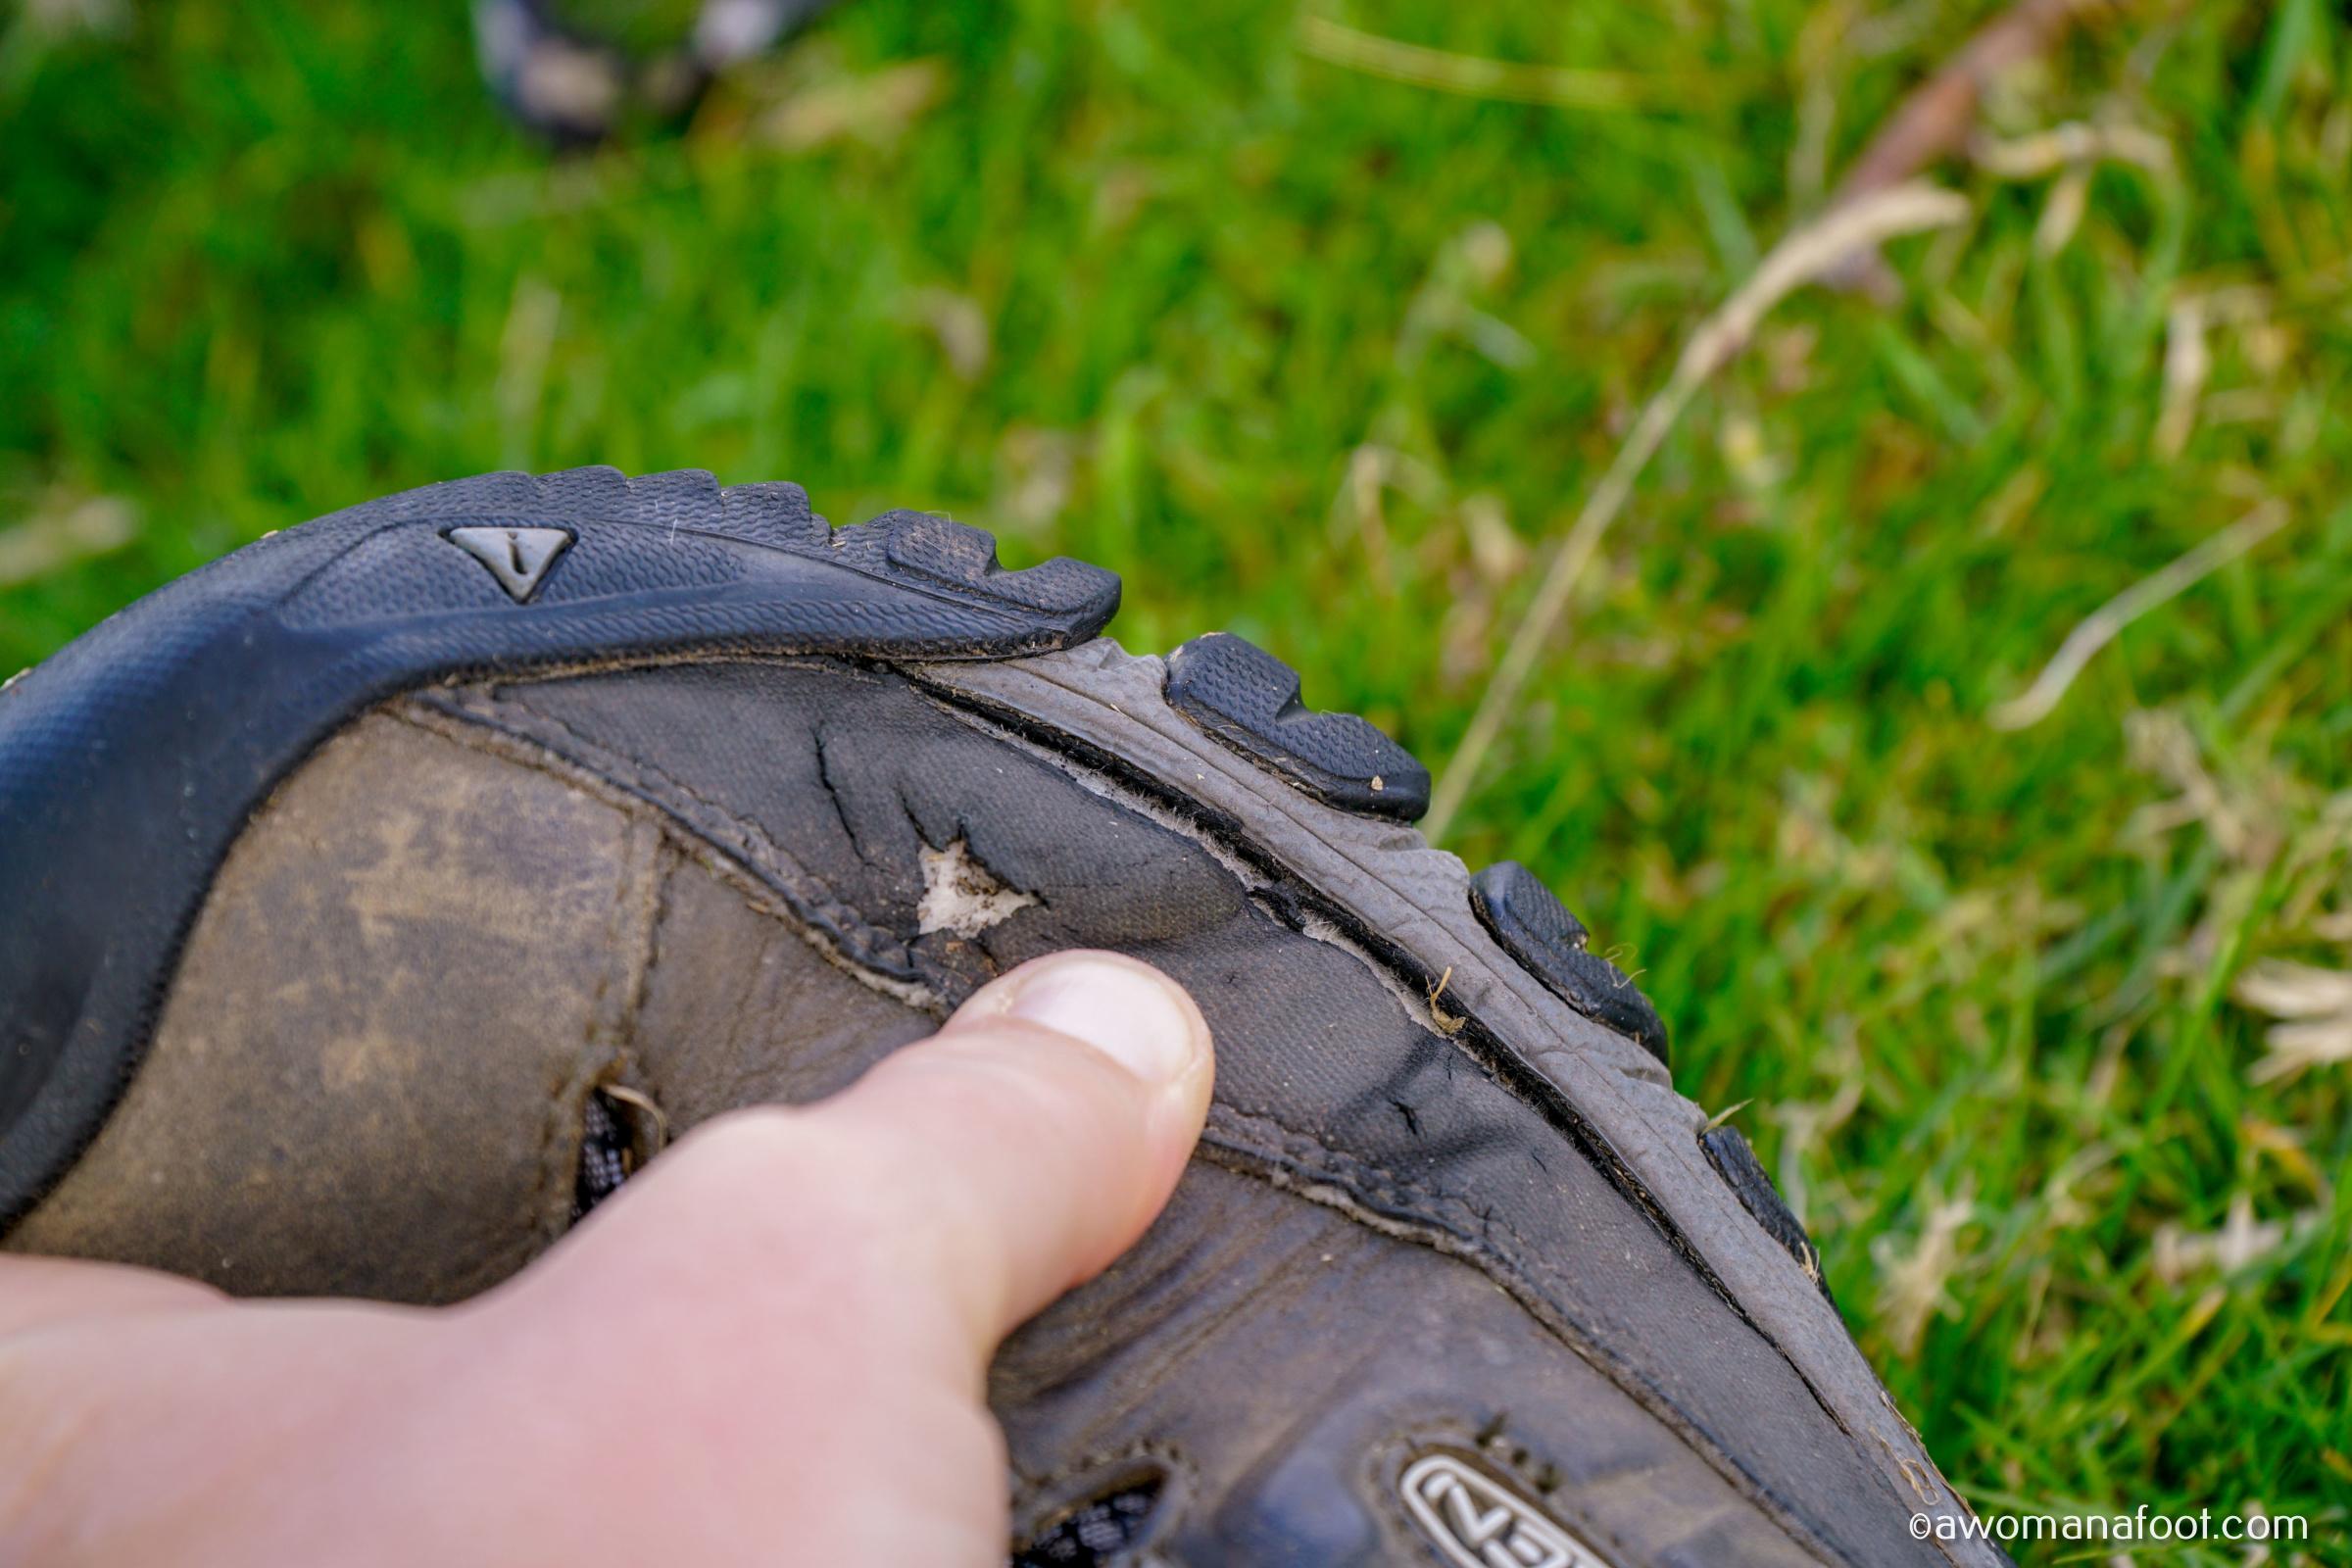 Keen Targhee III hiking boots women review7.jpg